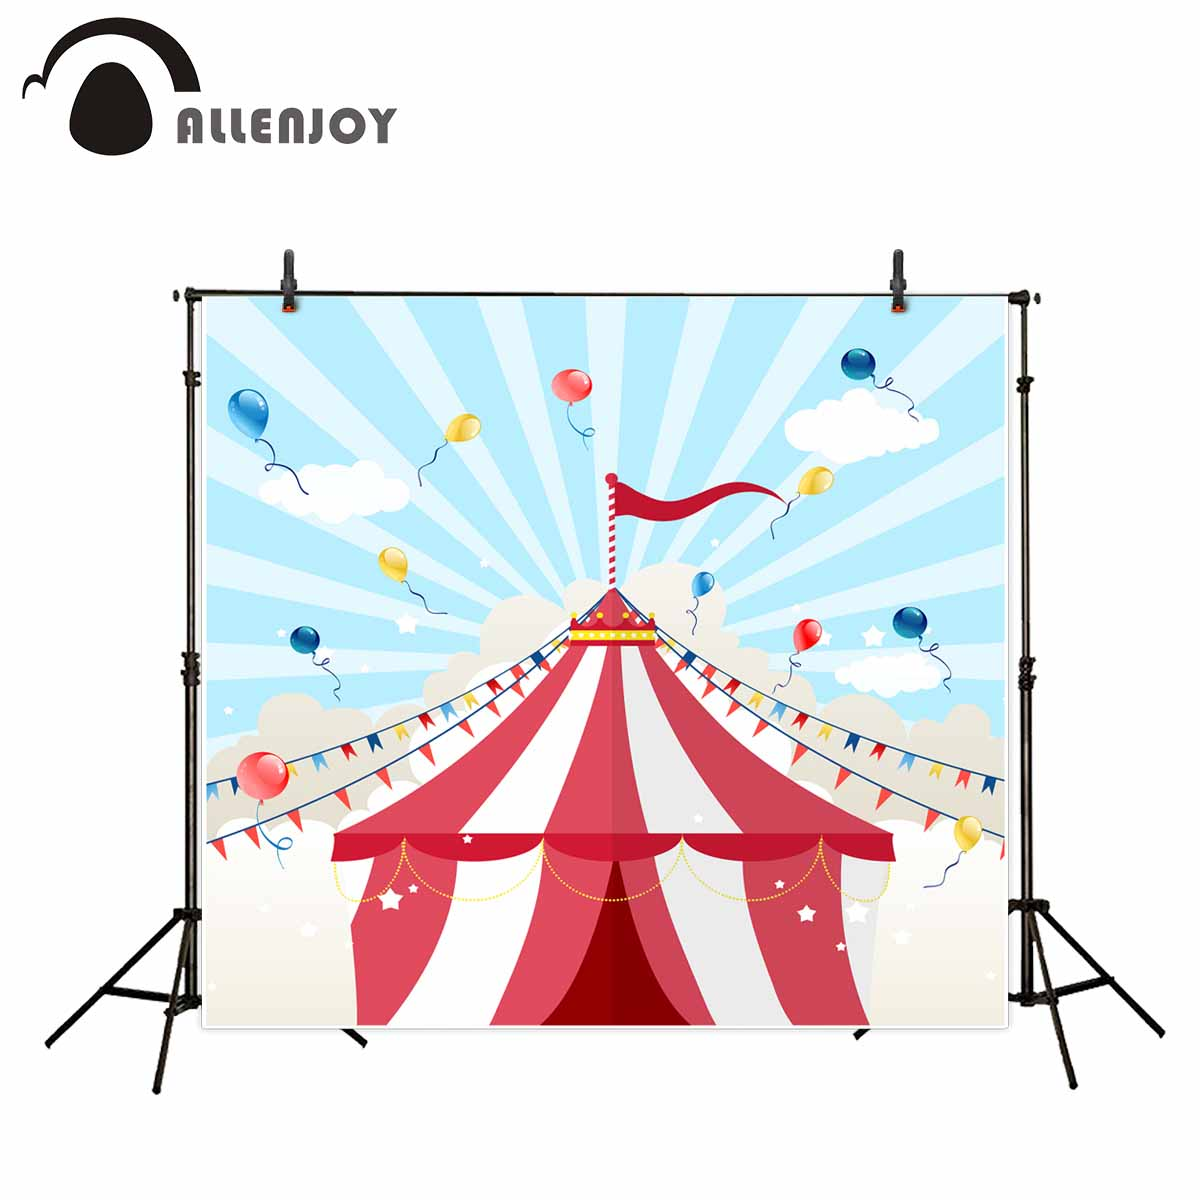 Allenjoy photography background cartoon circus tent colorful balloon flags backdrop photography studio camera fotografica стоимость